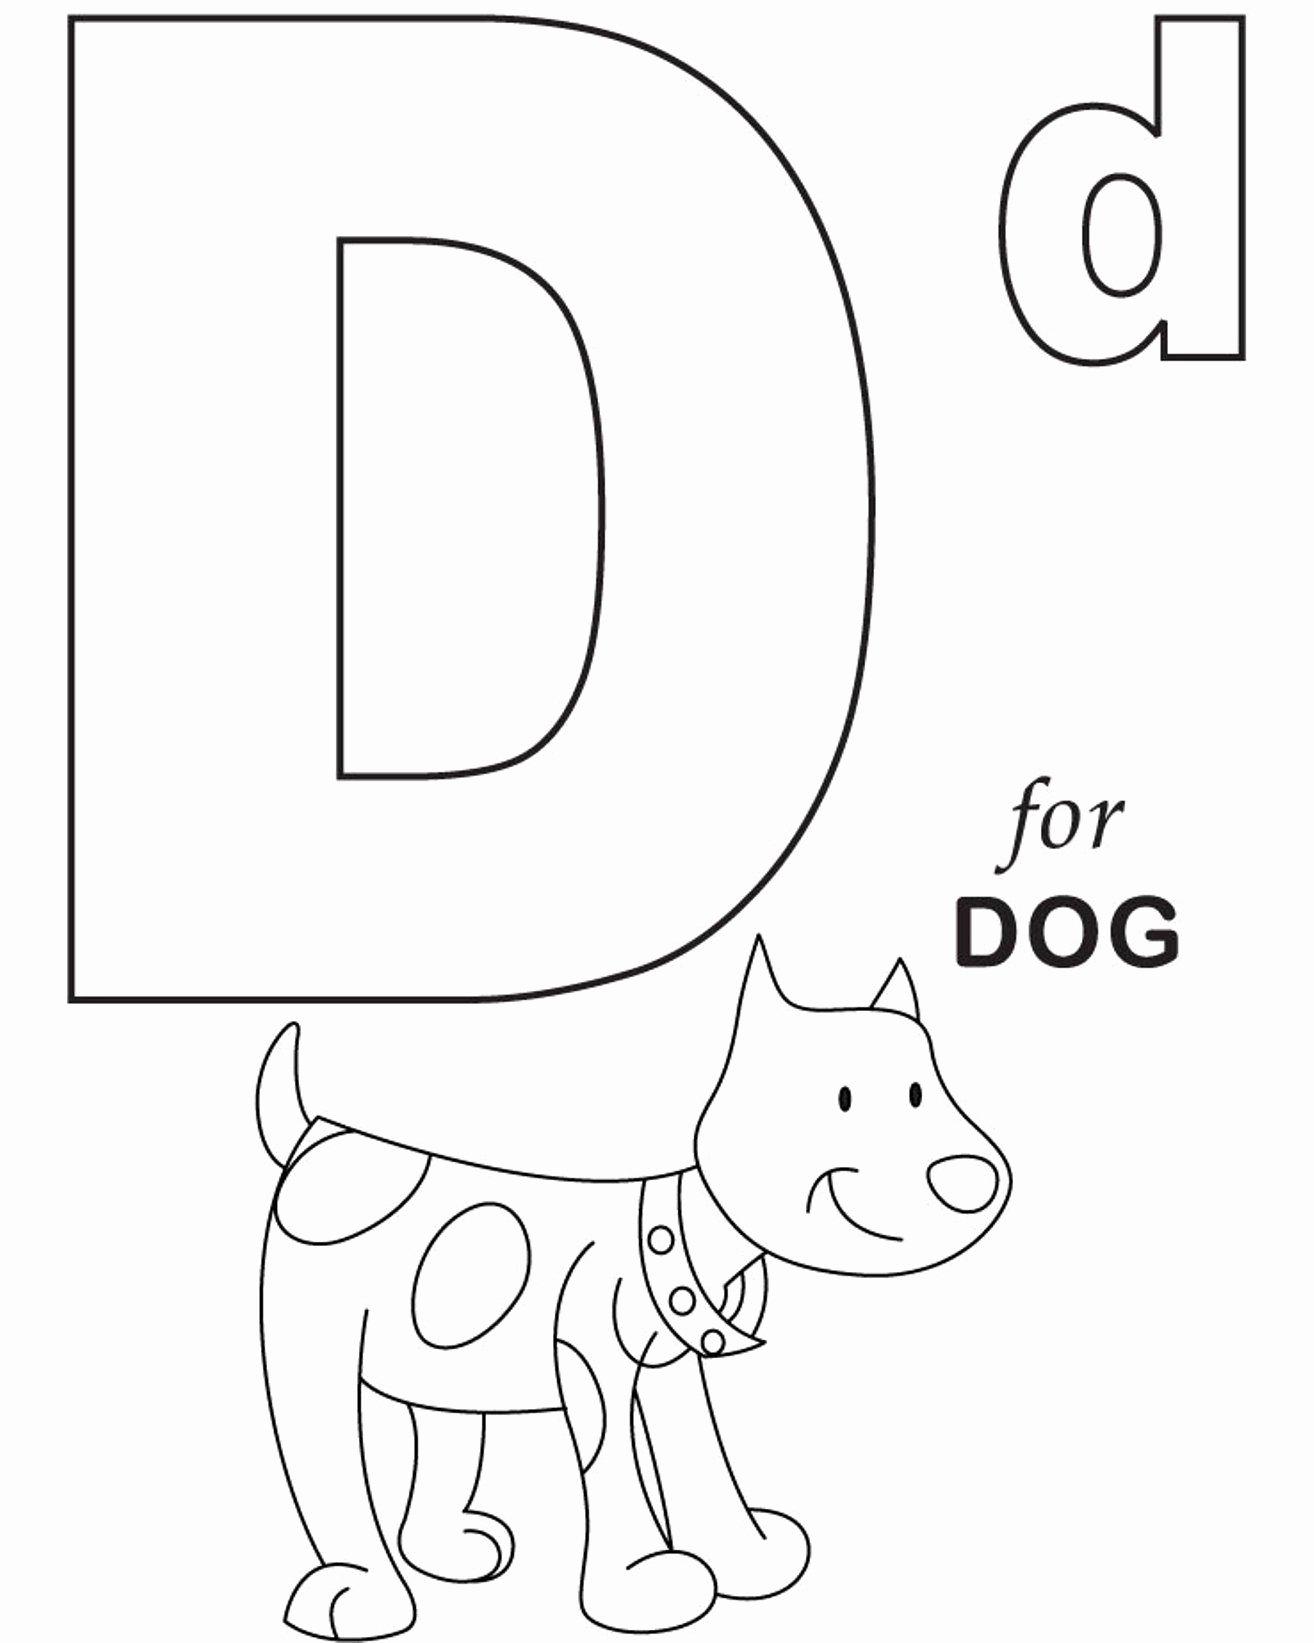 Dog Worksheets for Preschoolers Best Of Worksheets Alphabet Coloring for Dog Printable Tracing the